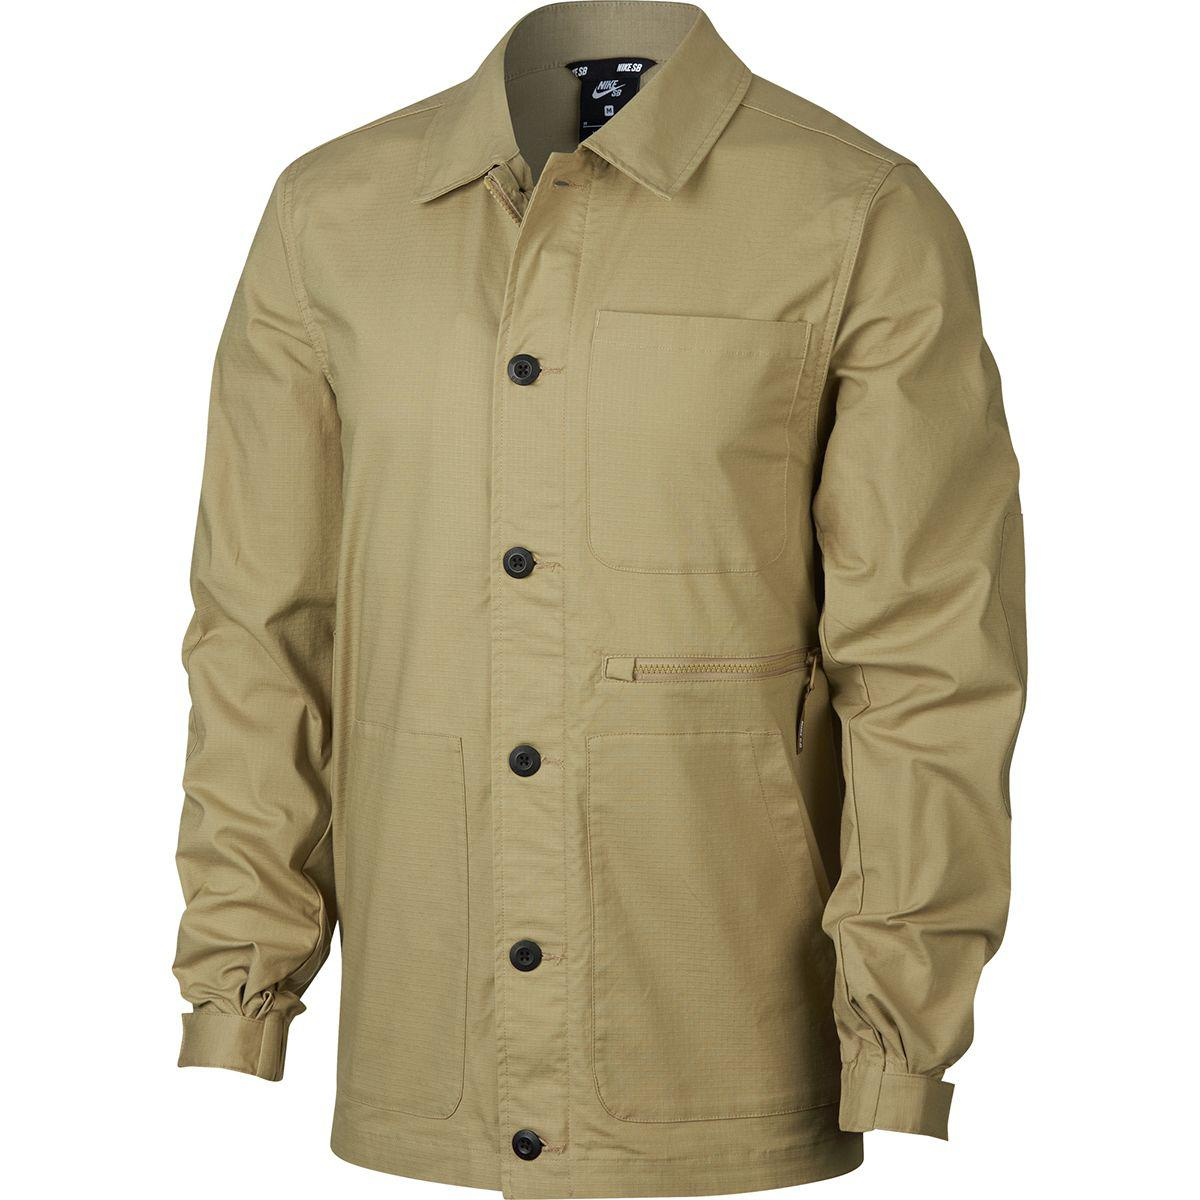 787d48a96e Lyst - Nike Sb Flex Coaches Chore Jacket for Men